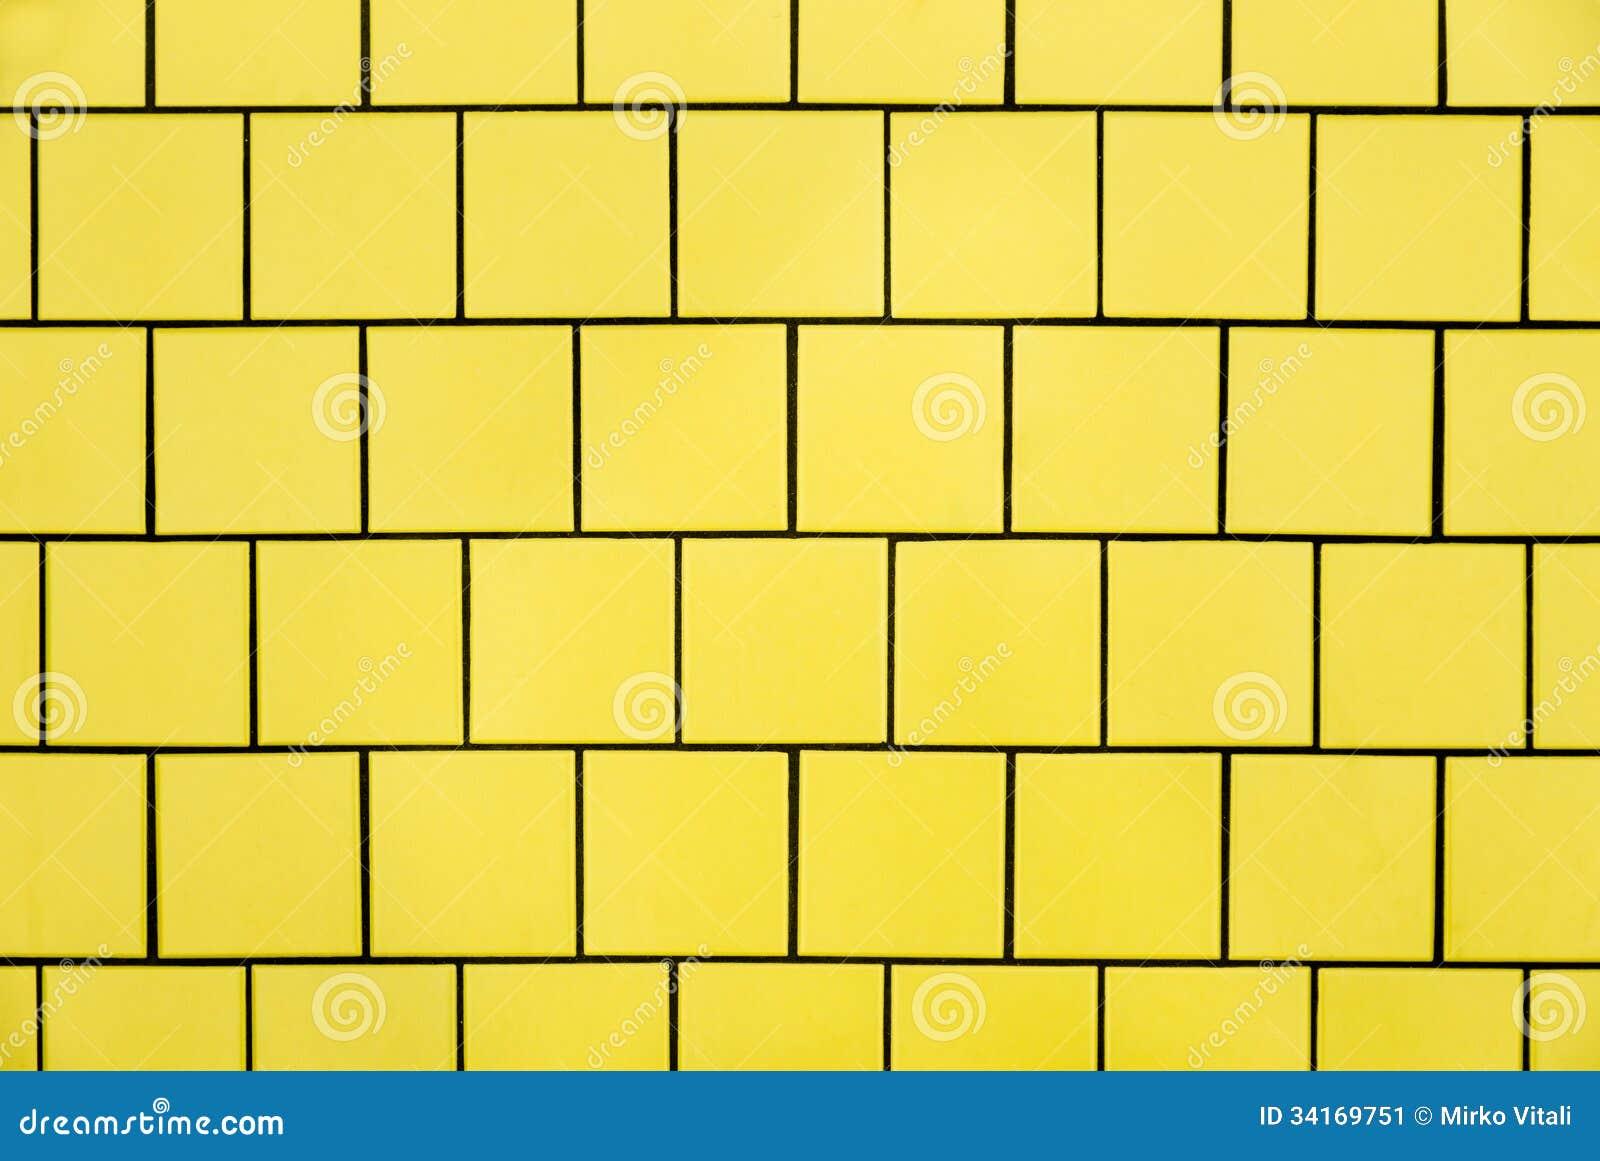 gelbe fliesen stockbild bild 34169751. Black Bedroom Furniture Sets. Home Design Ideas